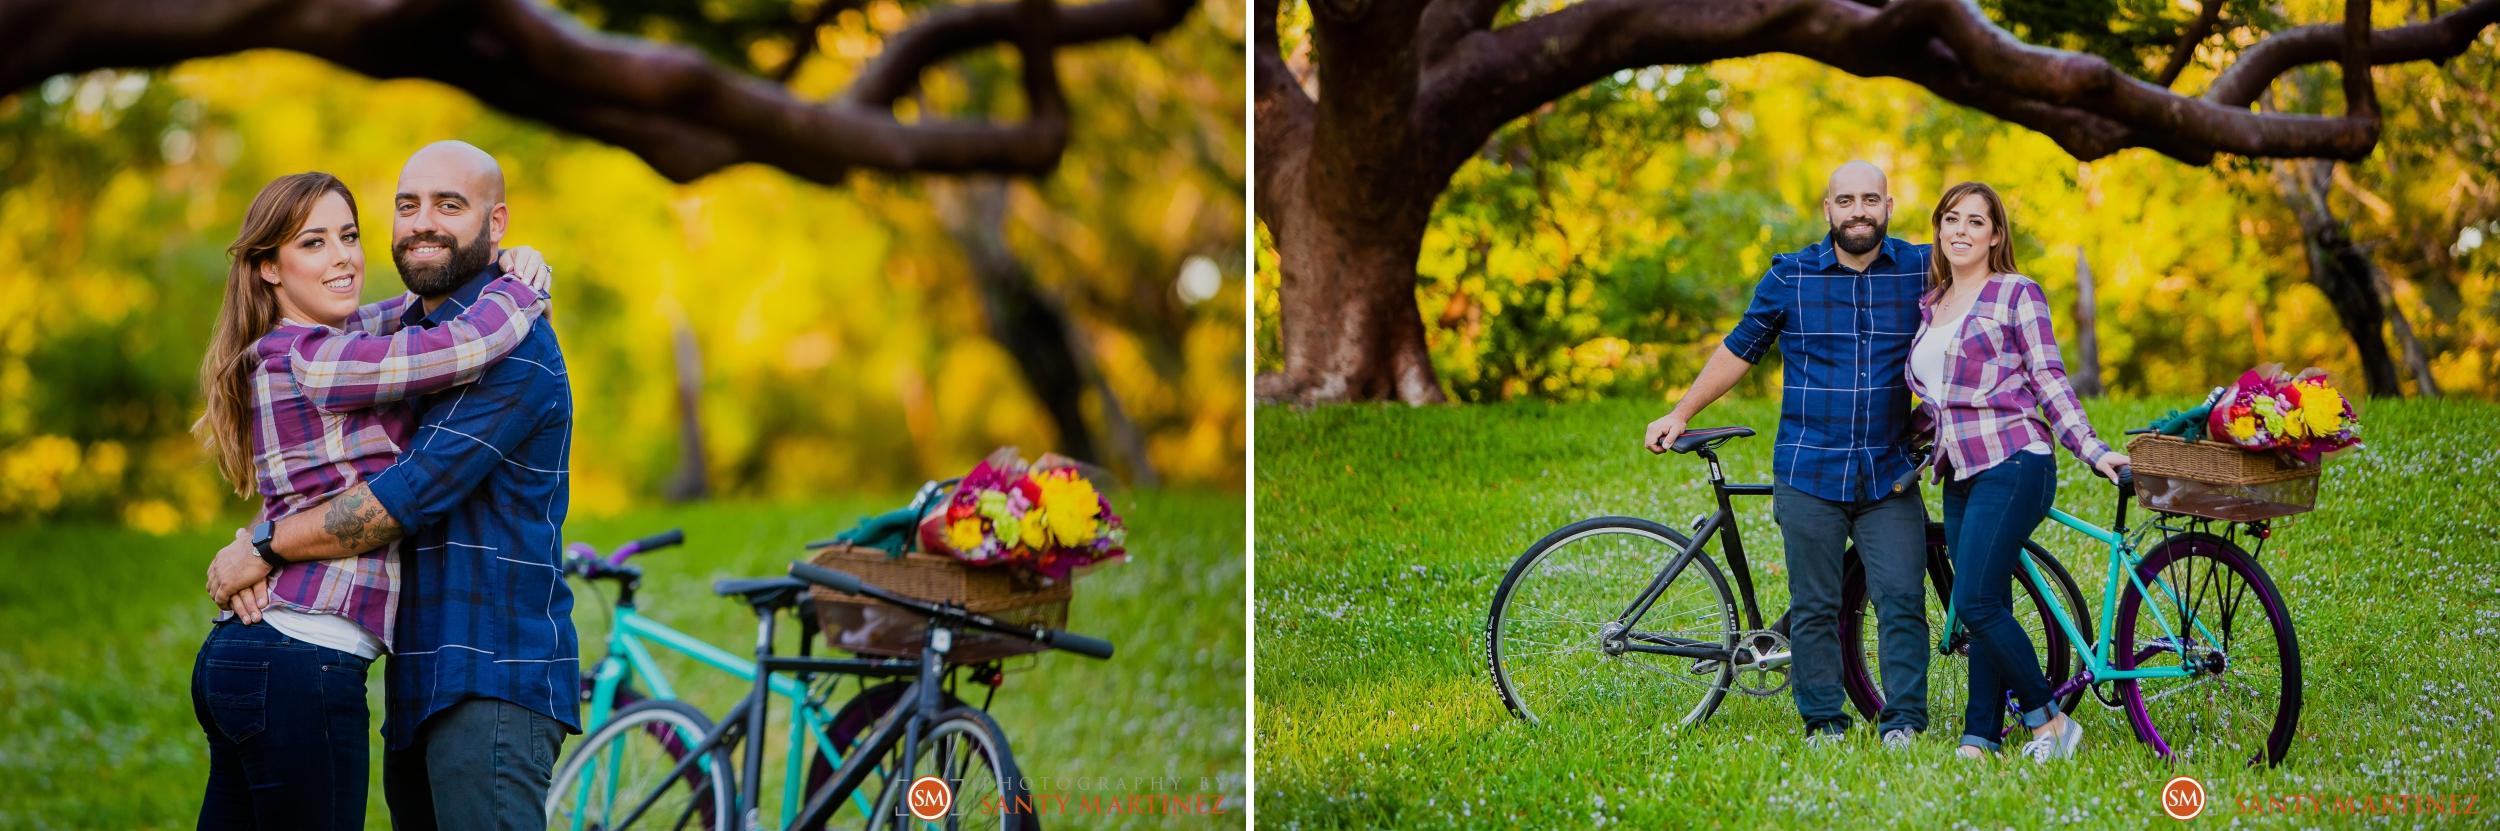 Engagement Session - Greynolds Park - Santy Martinez Photography 6.jpg